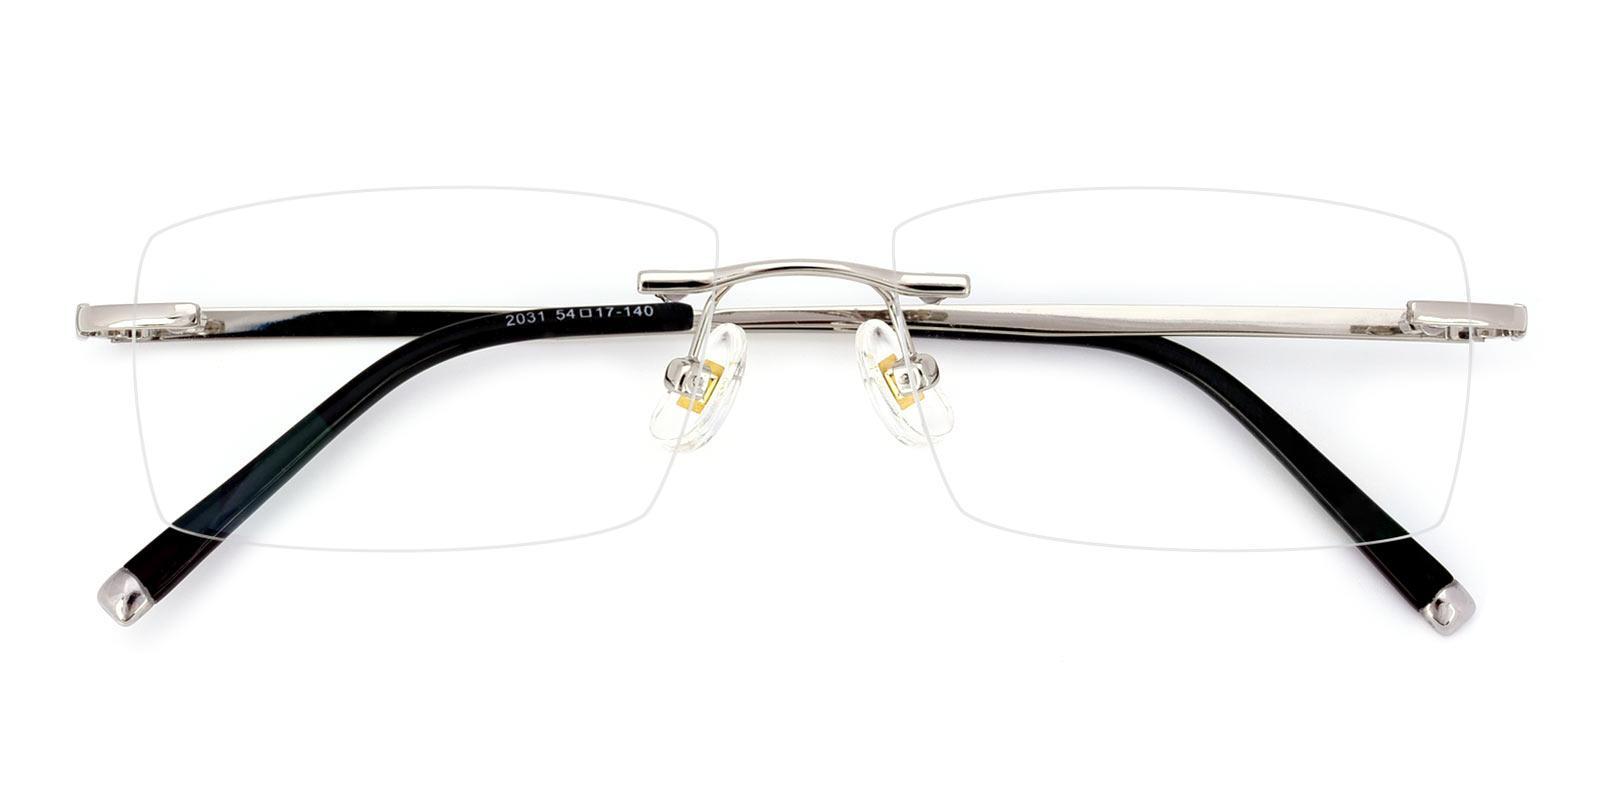 Edison-Silver-Varieties-Titanium-Eyeglasses-detail